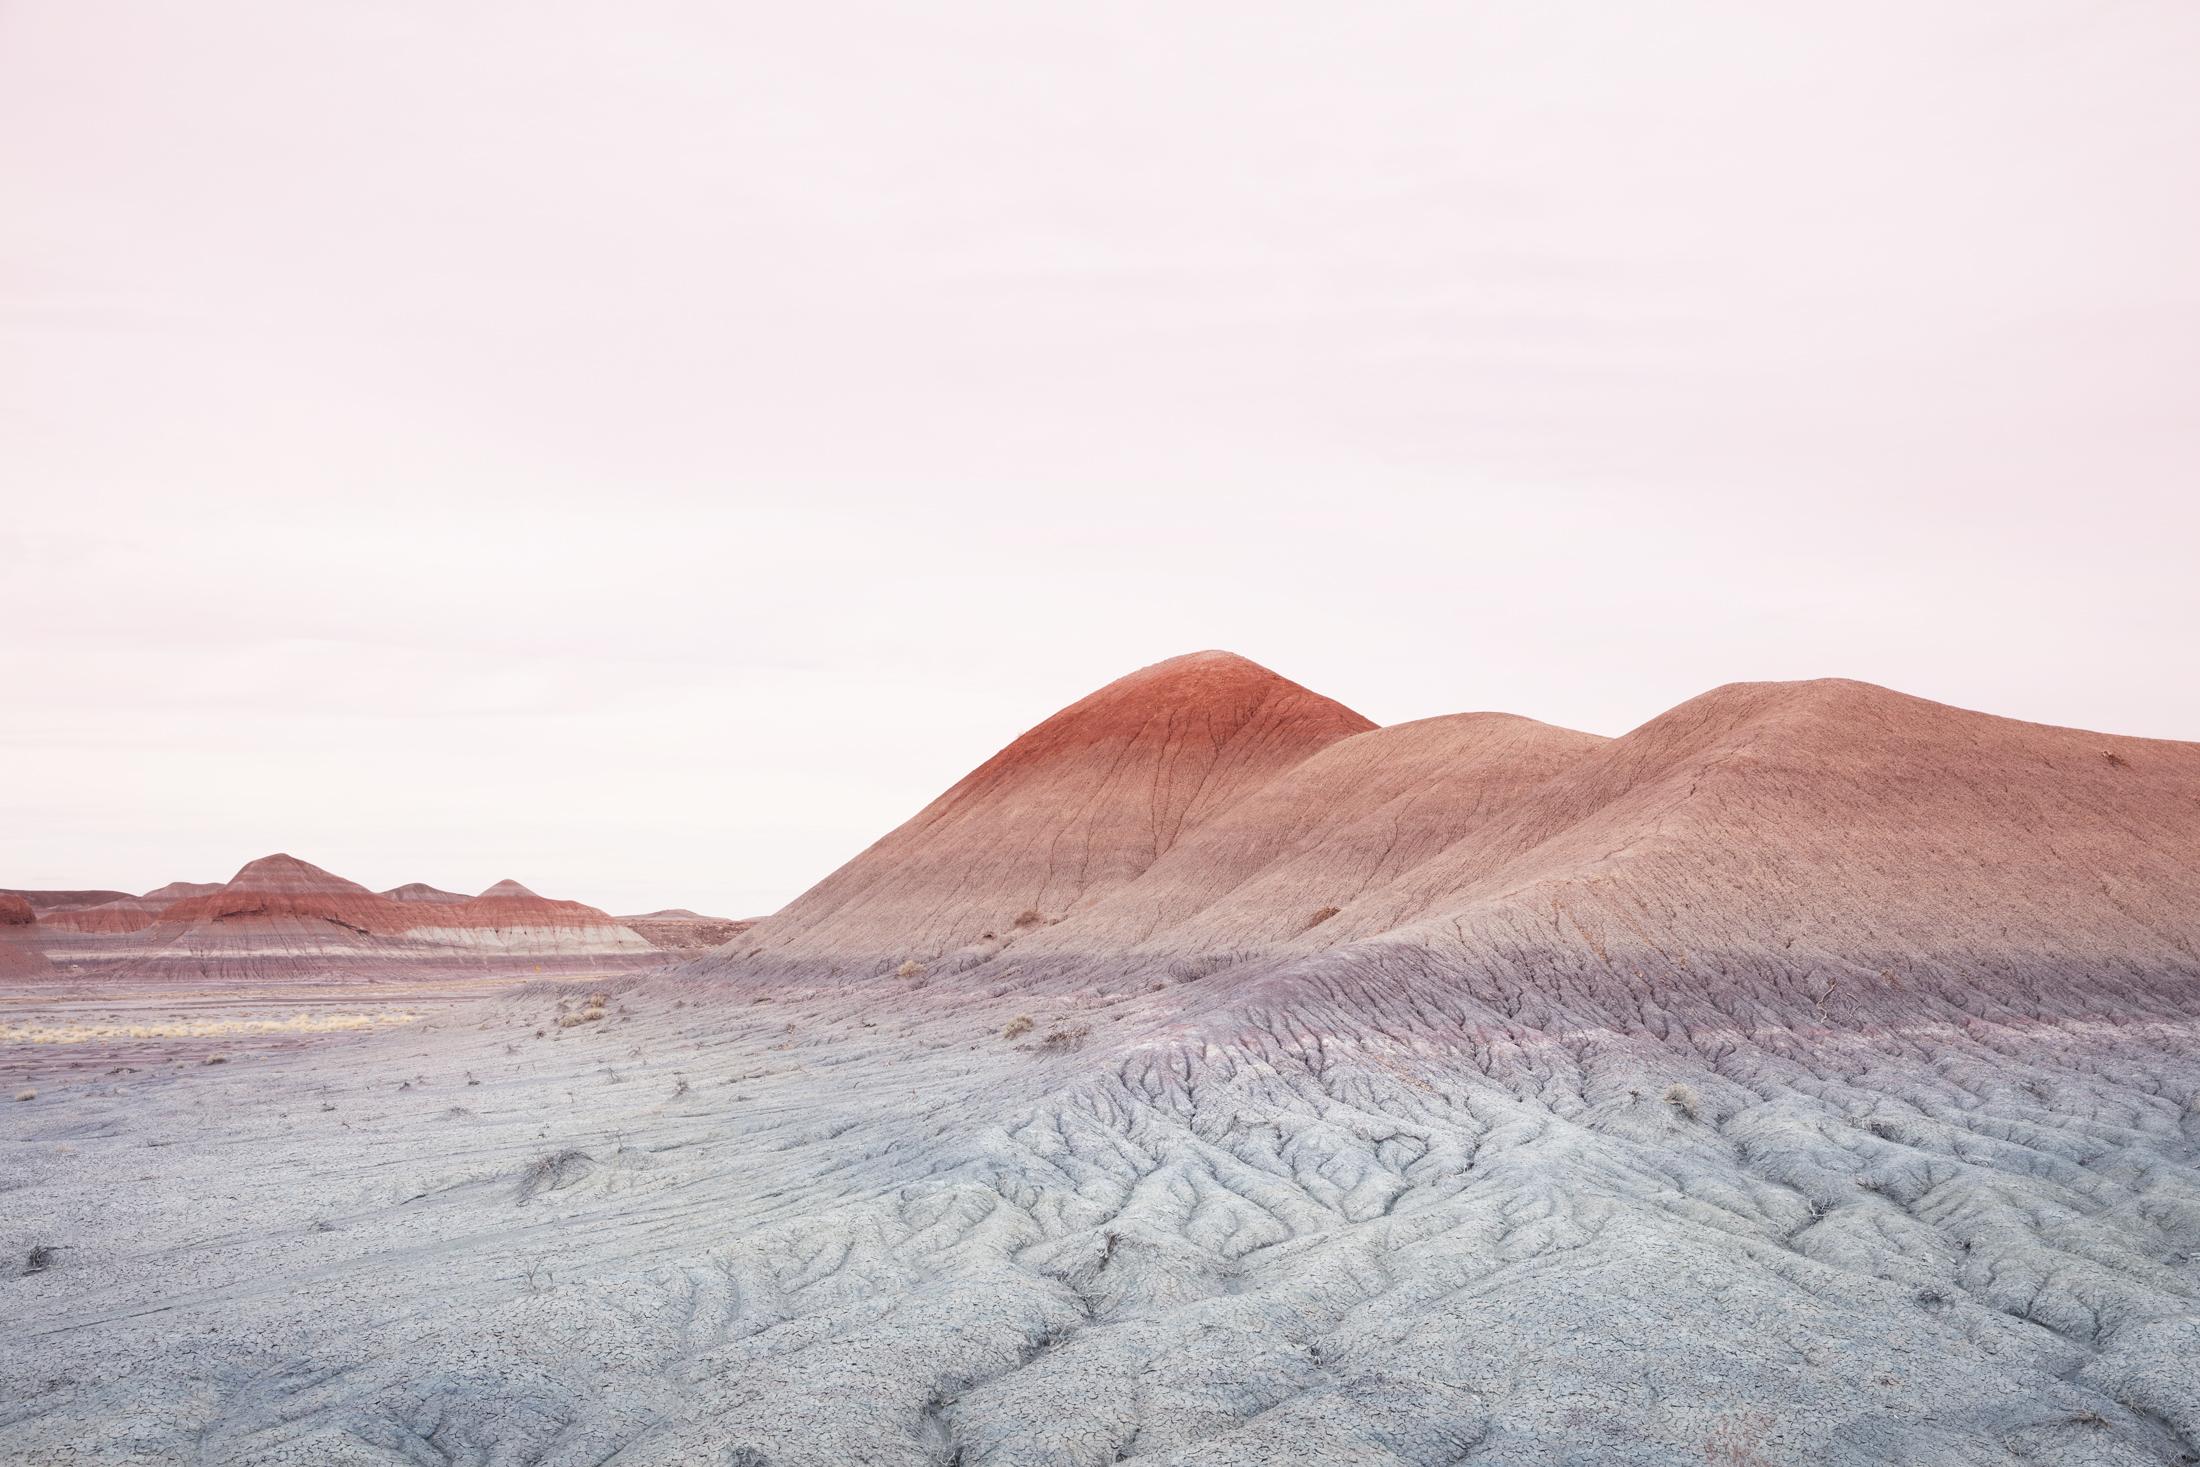 1) Badlands Series #4348, Arizona. Photograph, 32X48 inches, 2017.